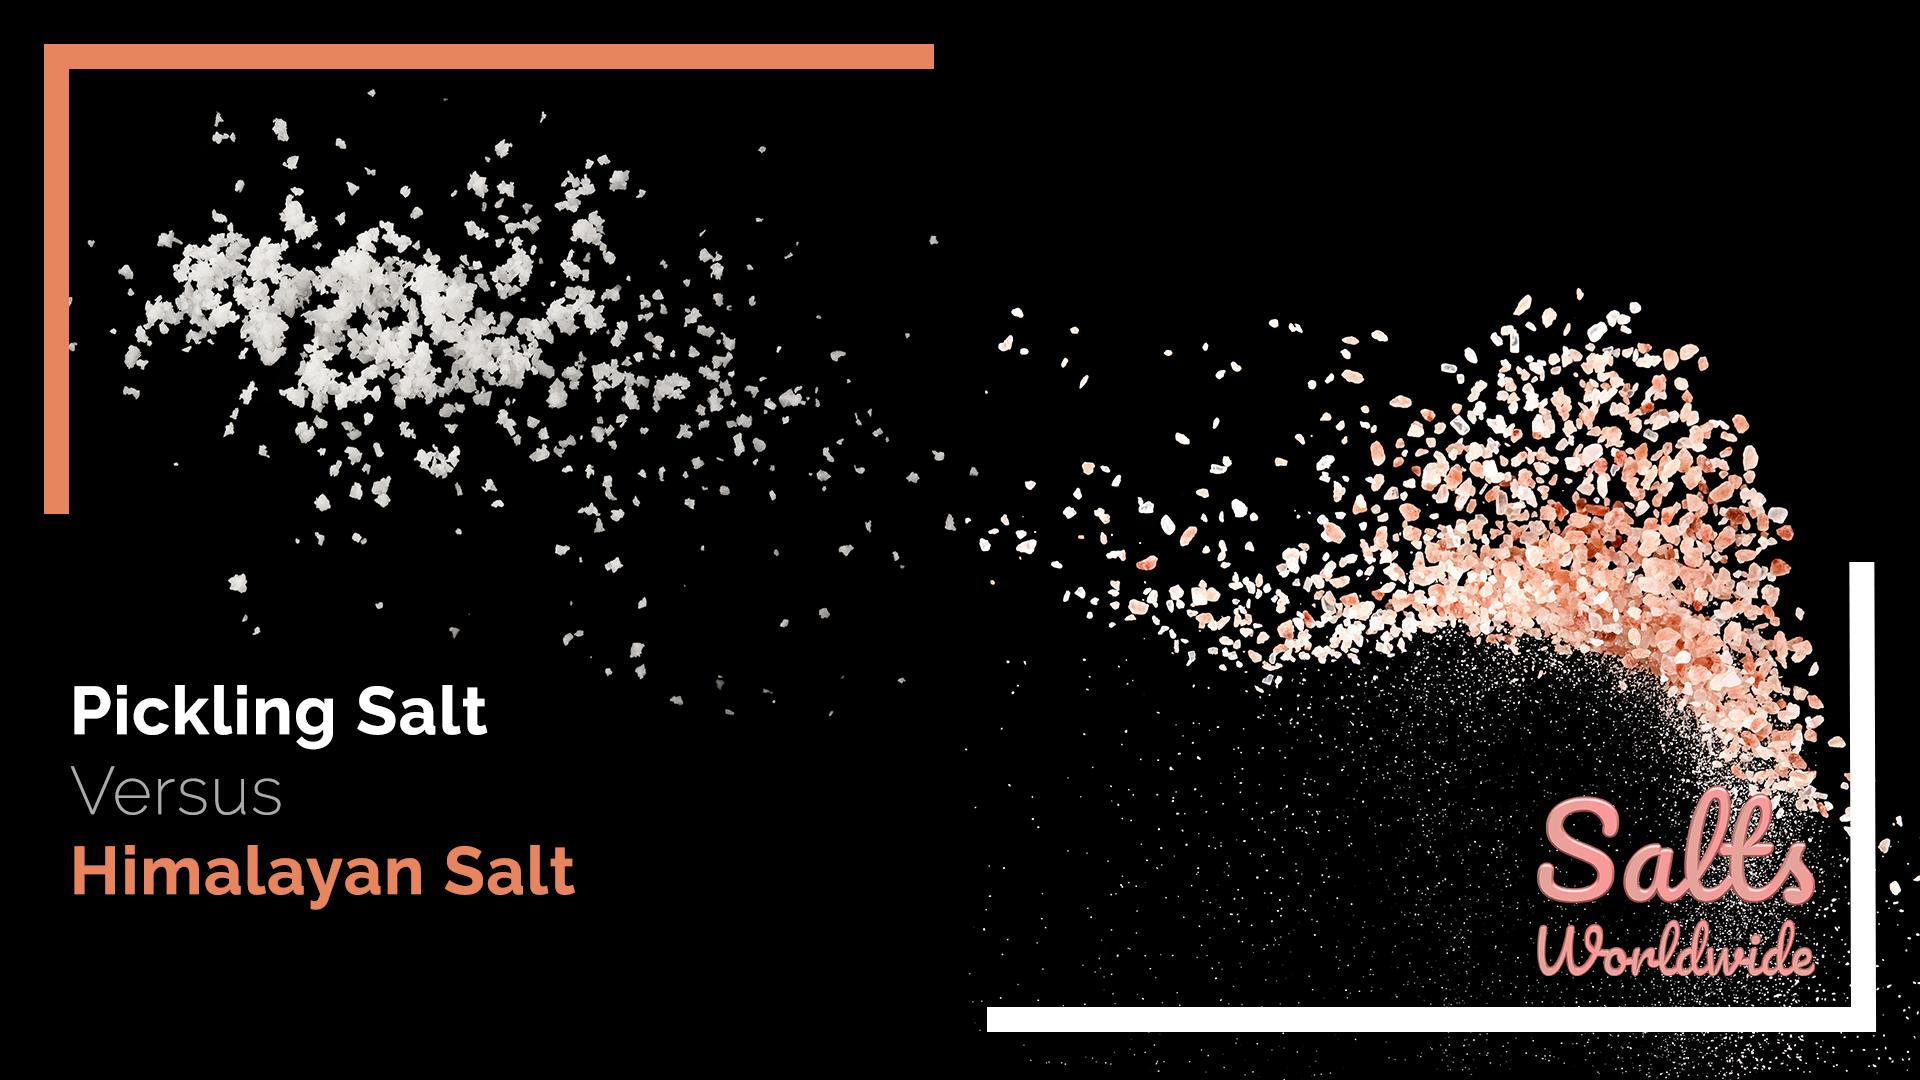 Pickling Salt Versus Himalayan Salt - featured image